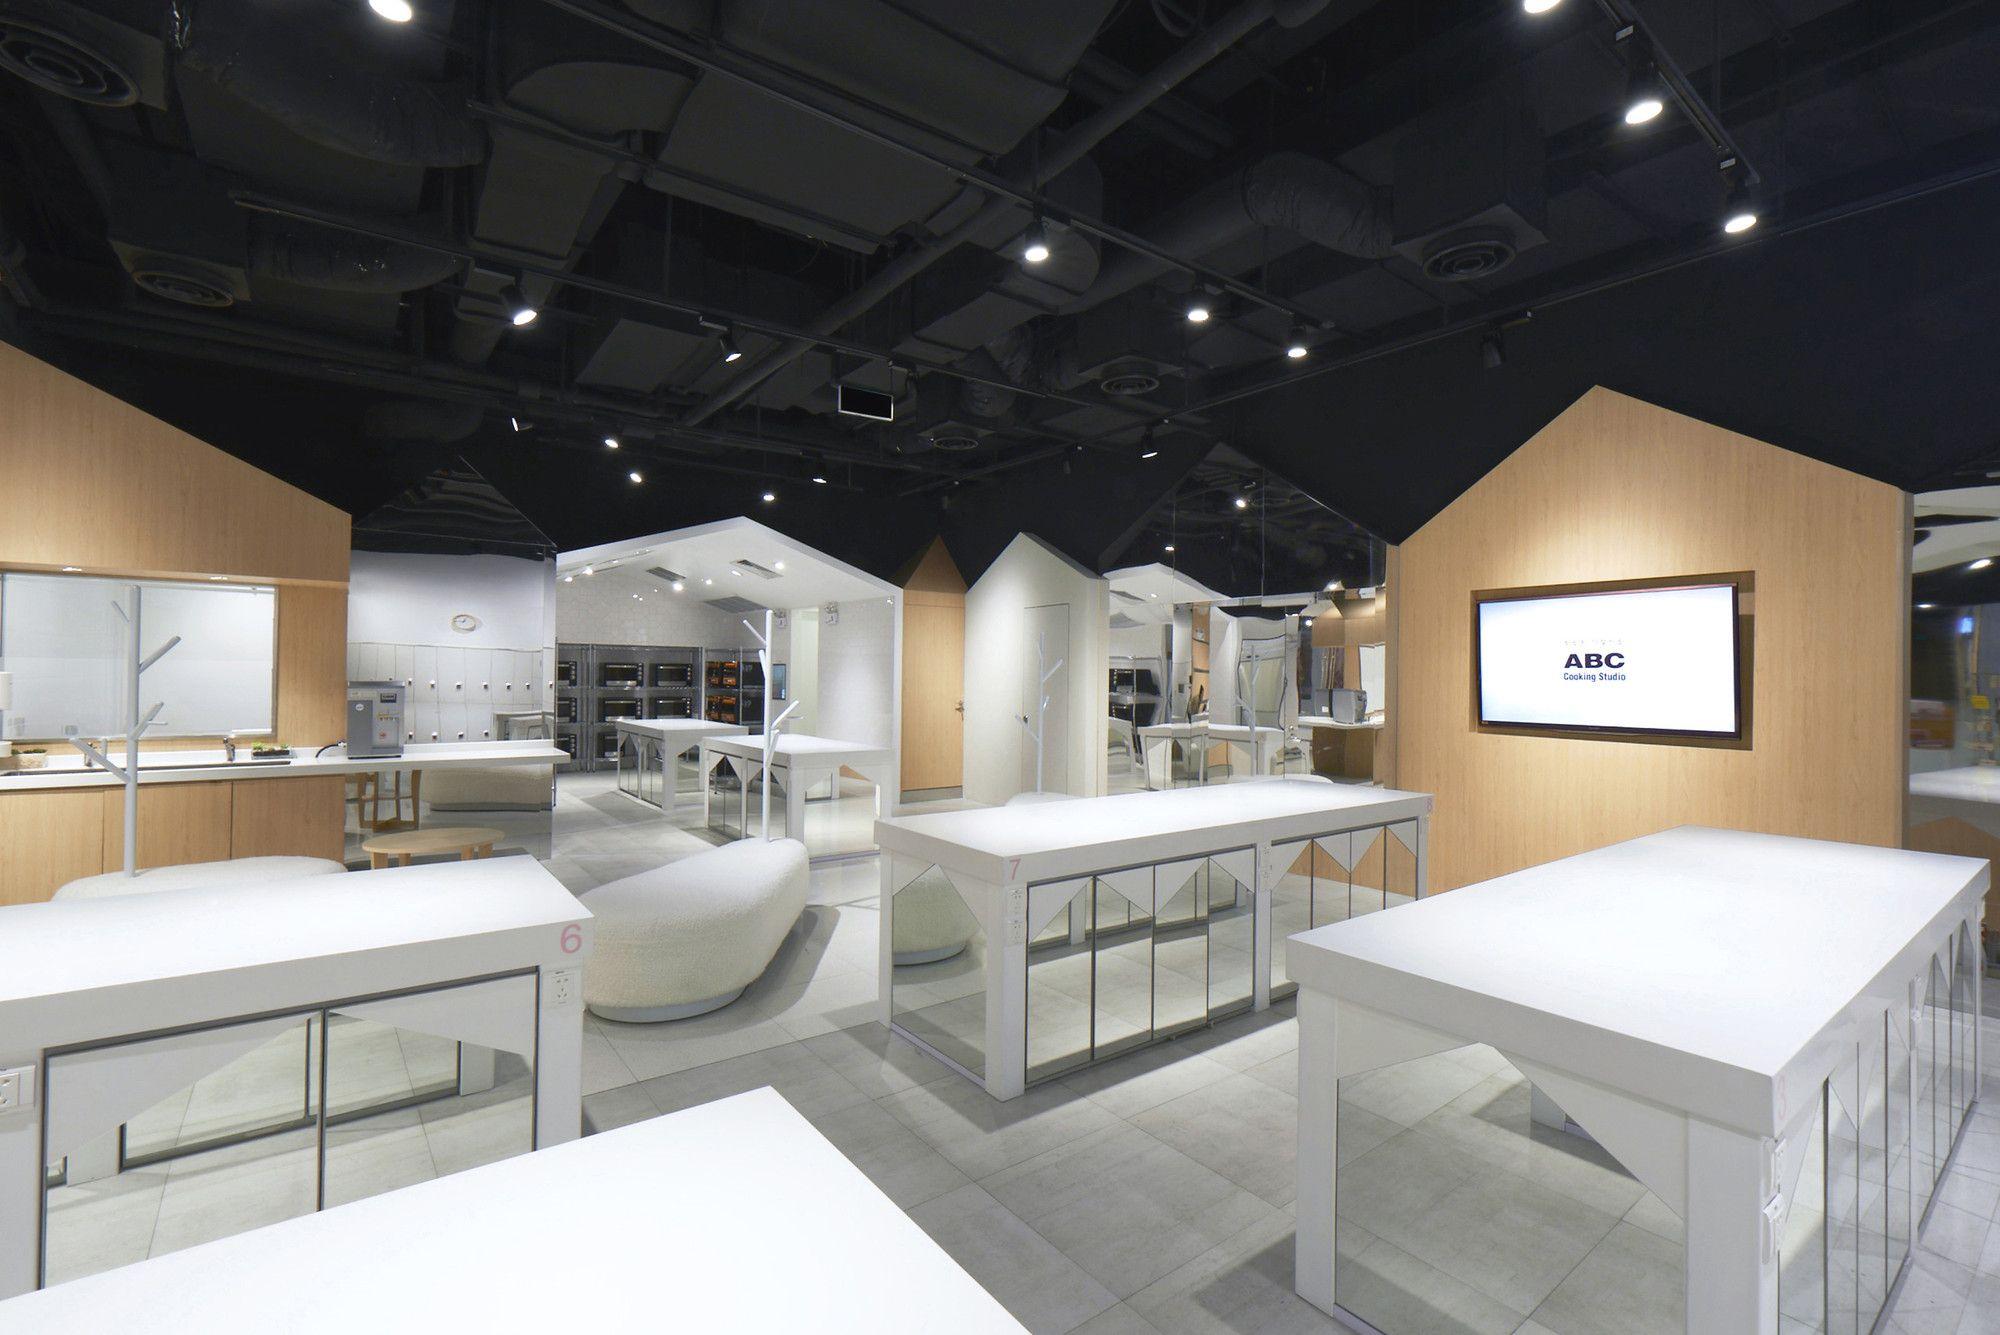 kitchen table cooking school ABC Cooking Studio Prism Design